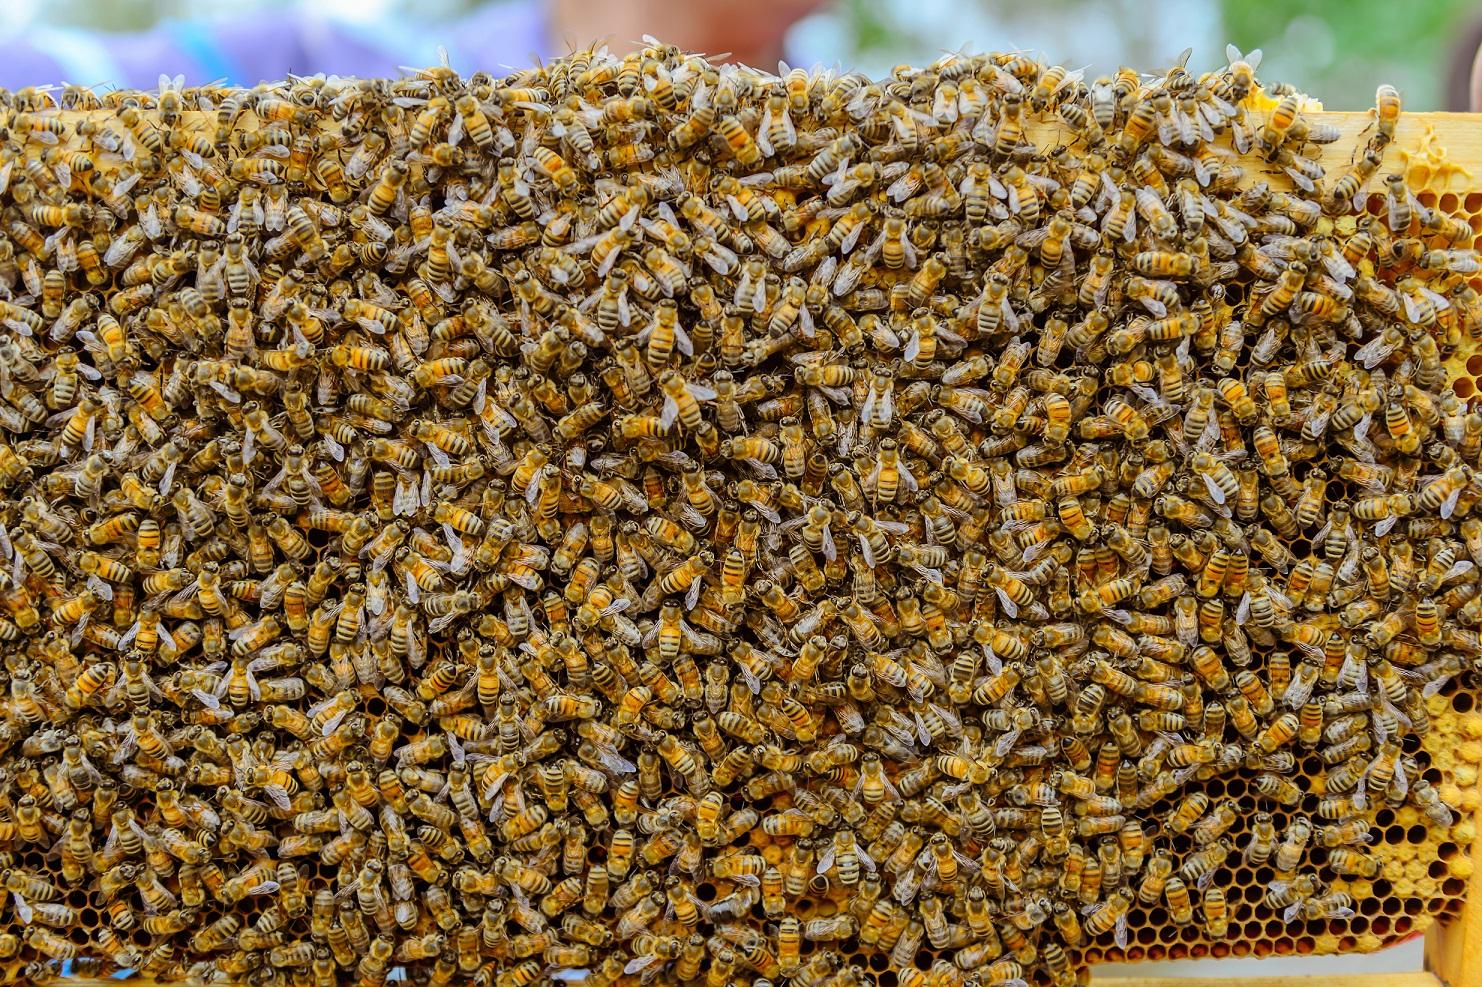 Naled Spraying In South Carolina To Combat Zika Kills